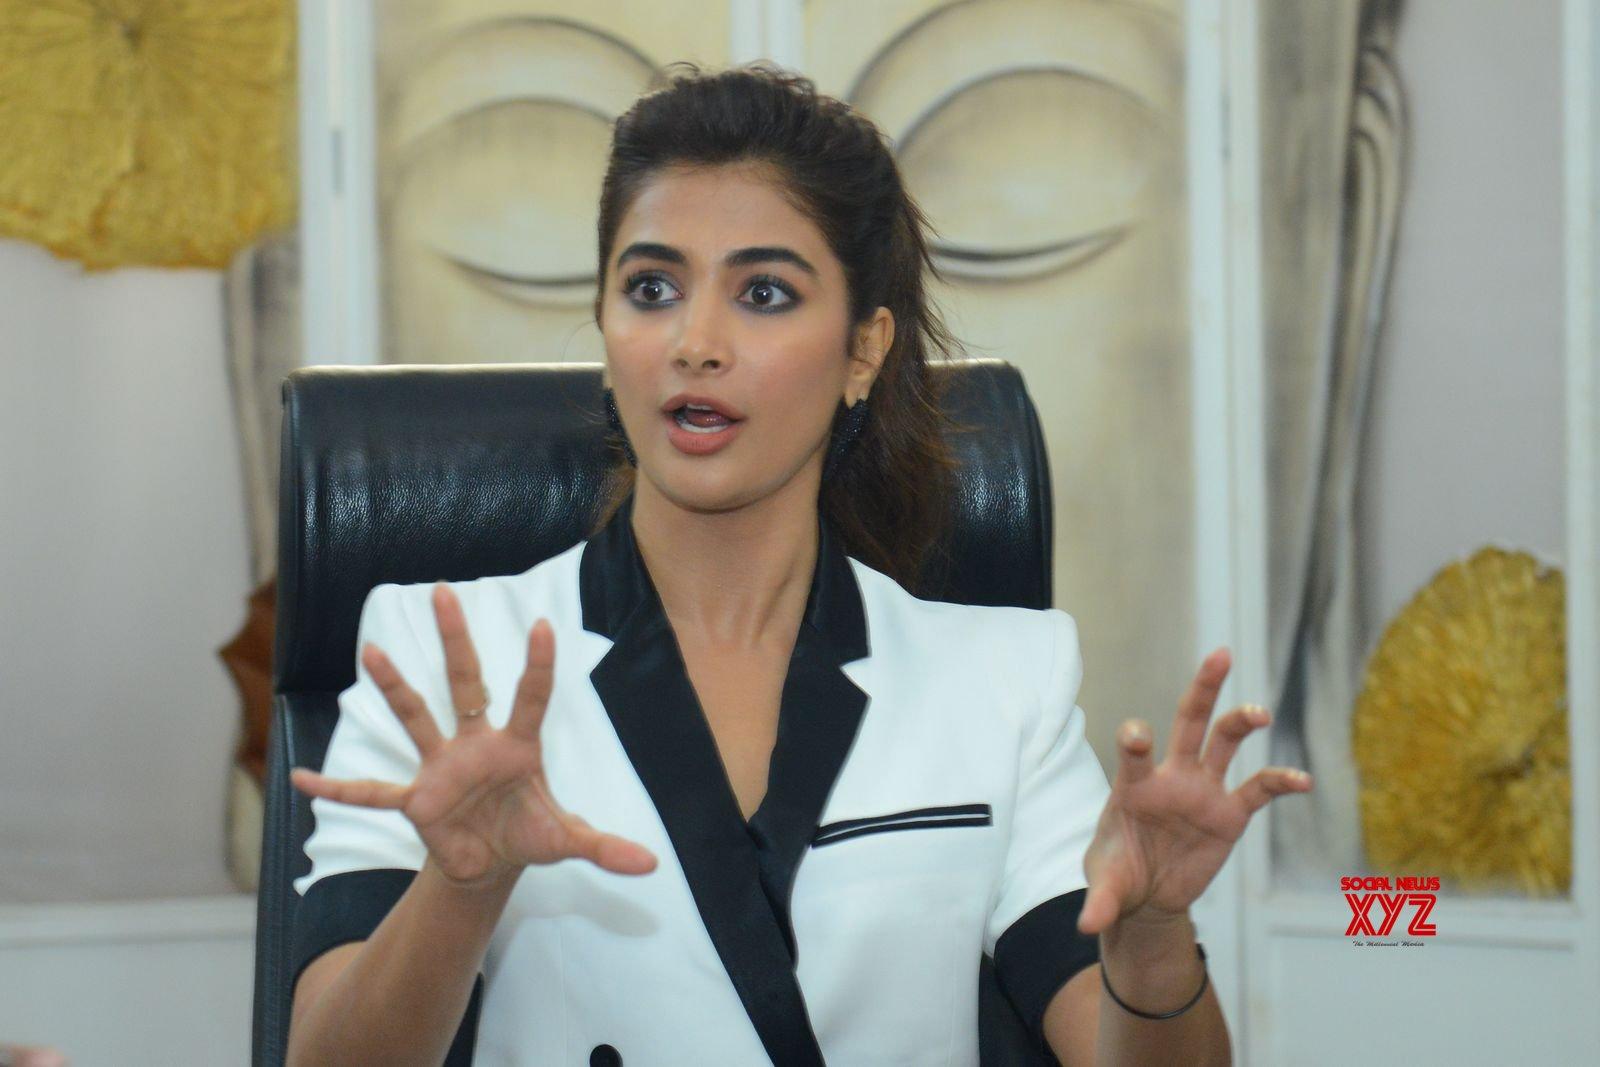 Actress Pooja Hegde Hot Stills From Allu Arjun's Ala Vaikunthapurramuloo Movie Interview Set 2